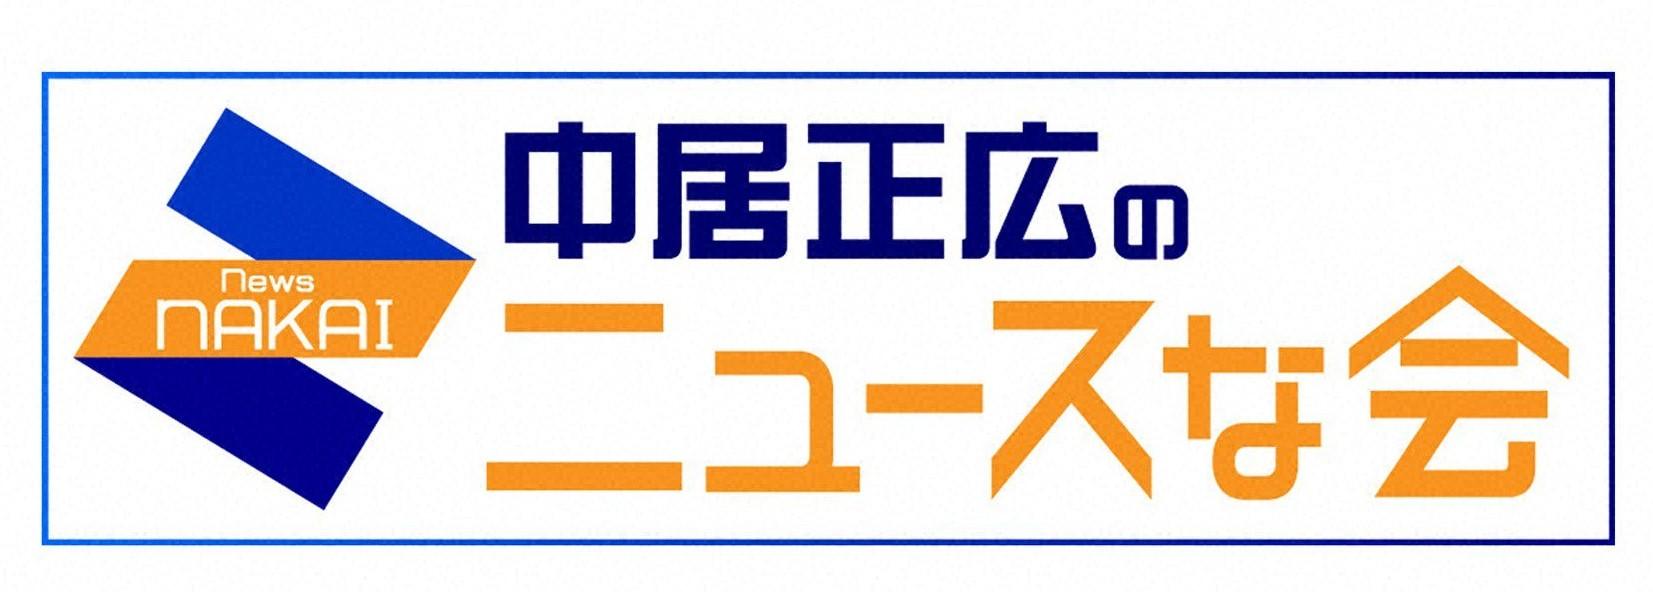 L_中居正広のニュースな会」ロゴ_1